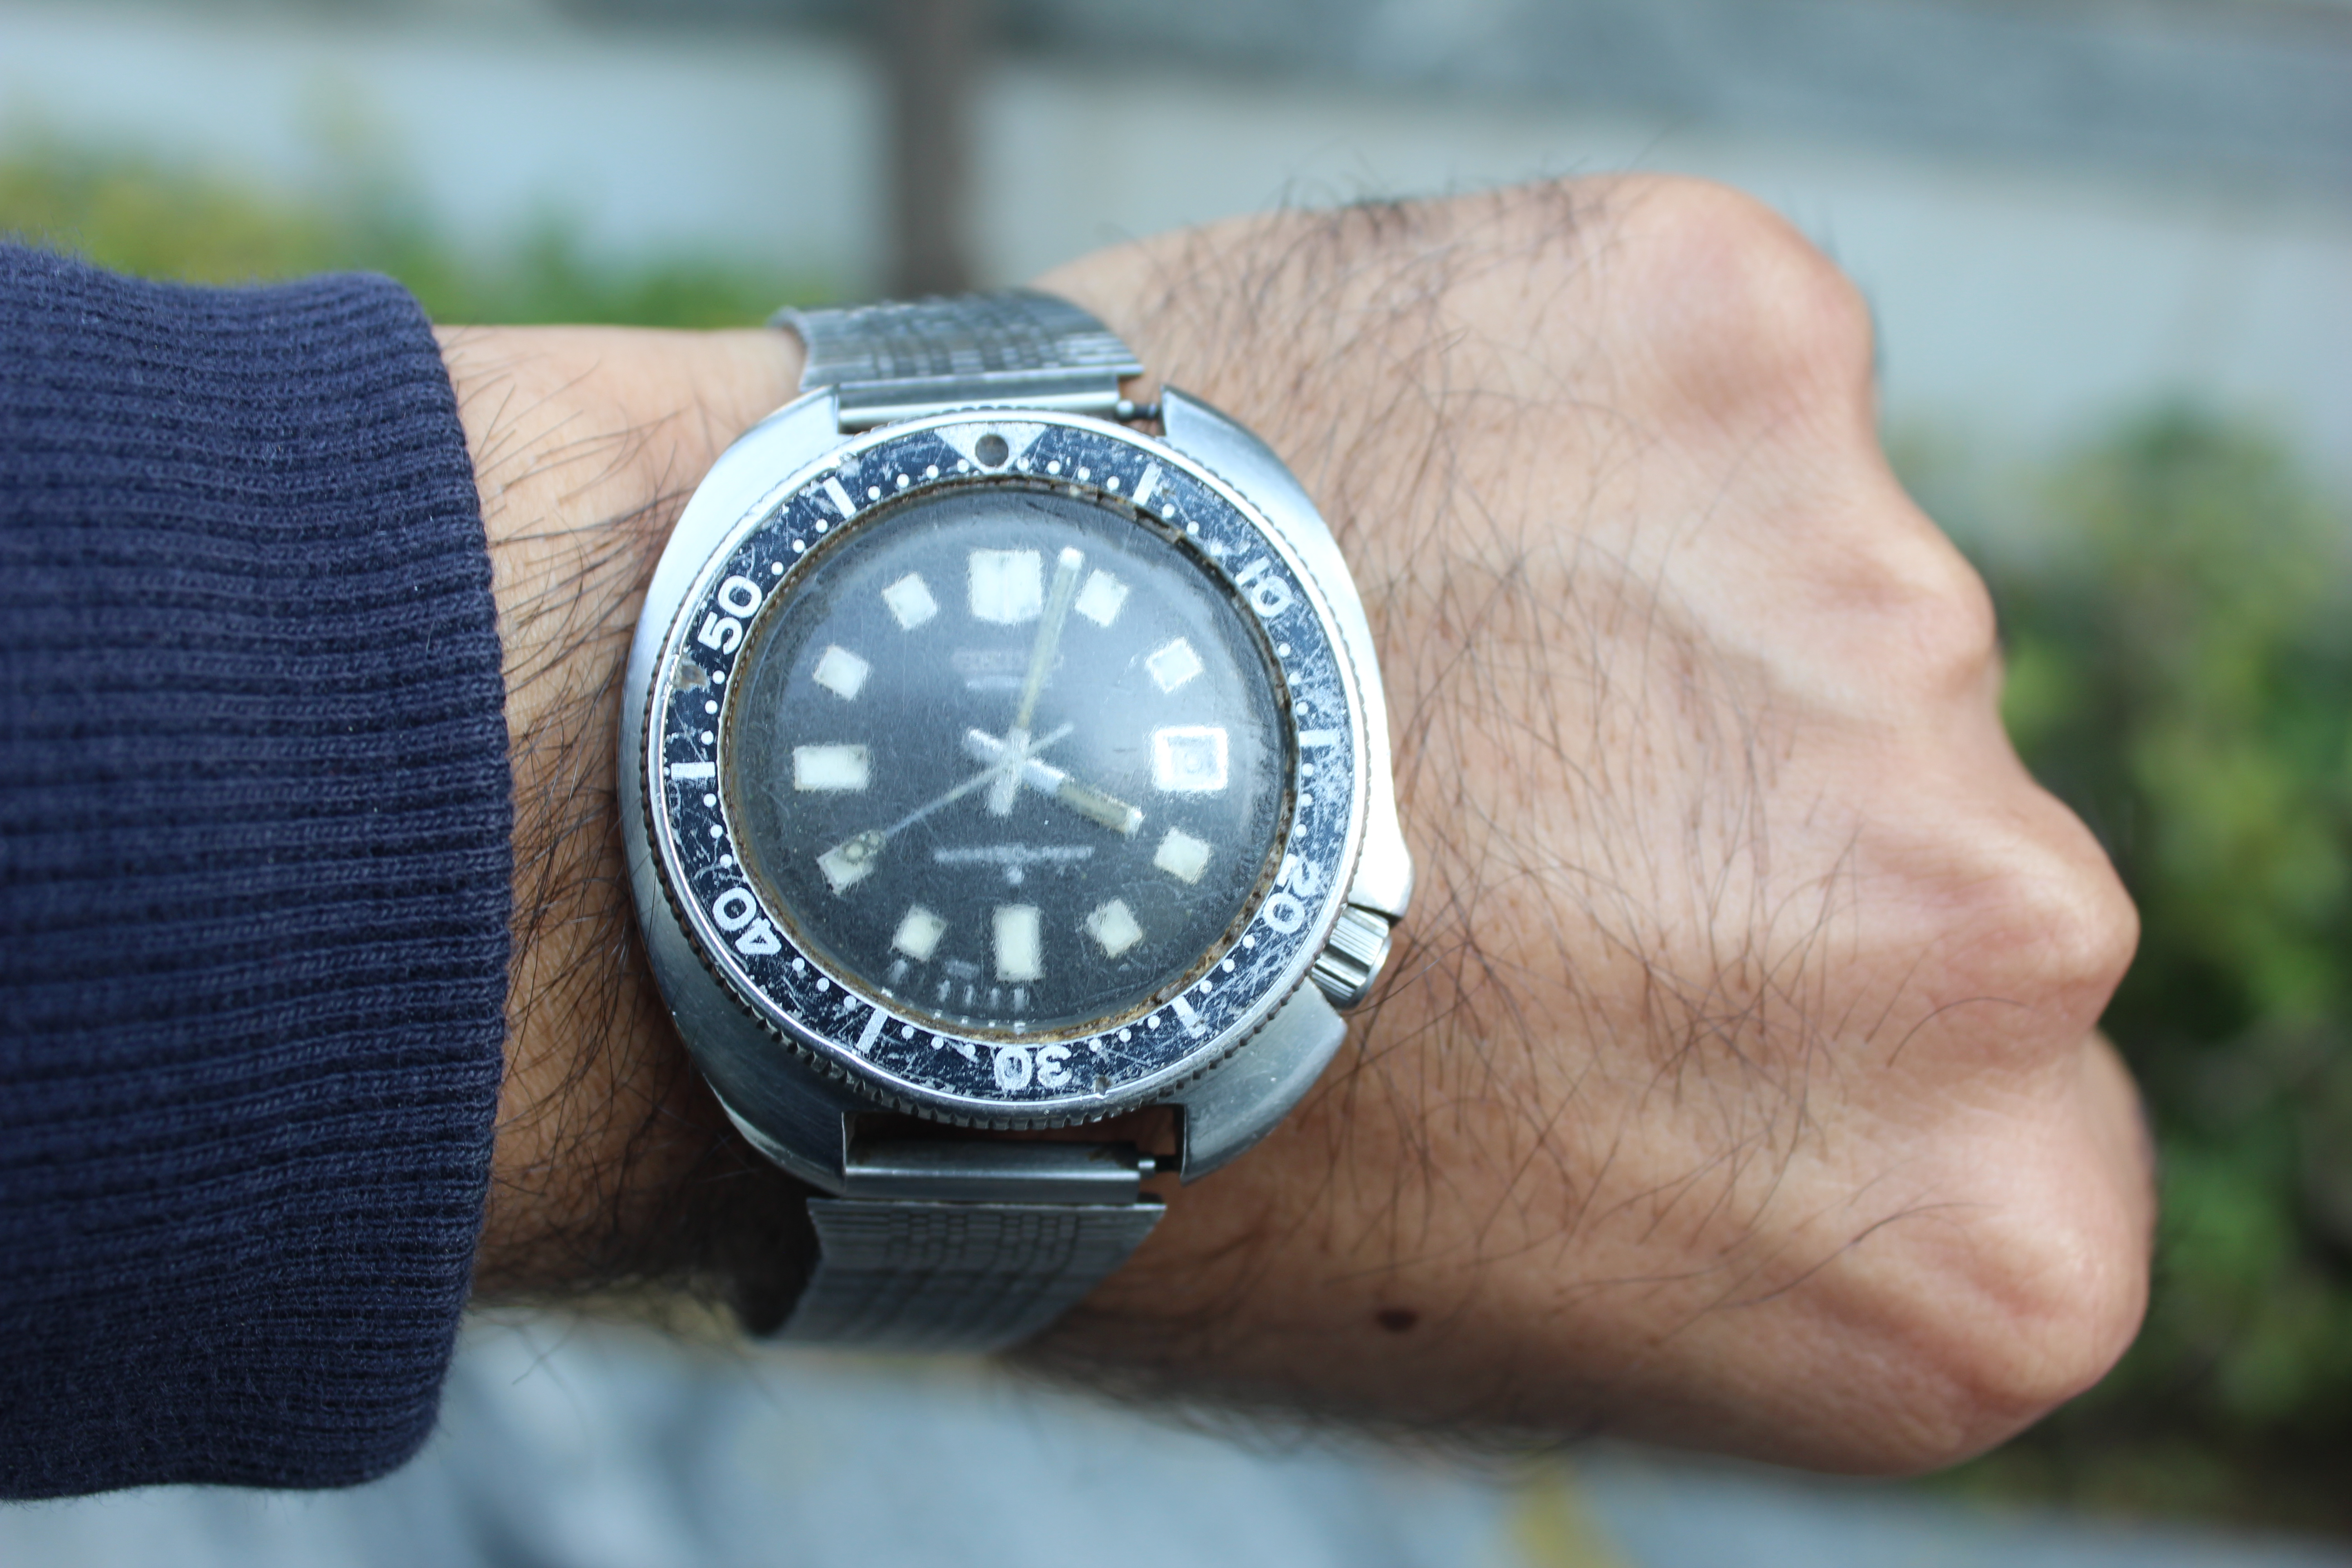 Seiko 6105-8110 Diver Watch Review